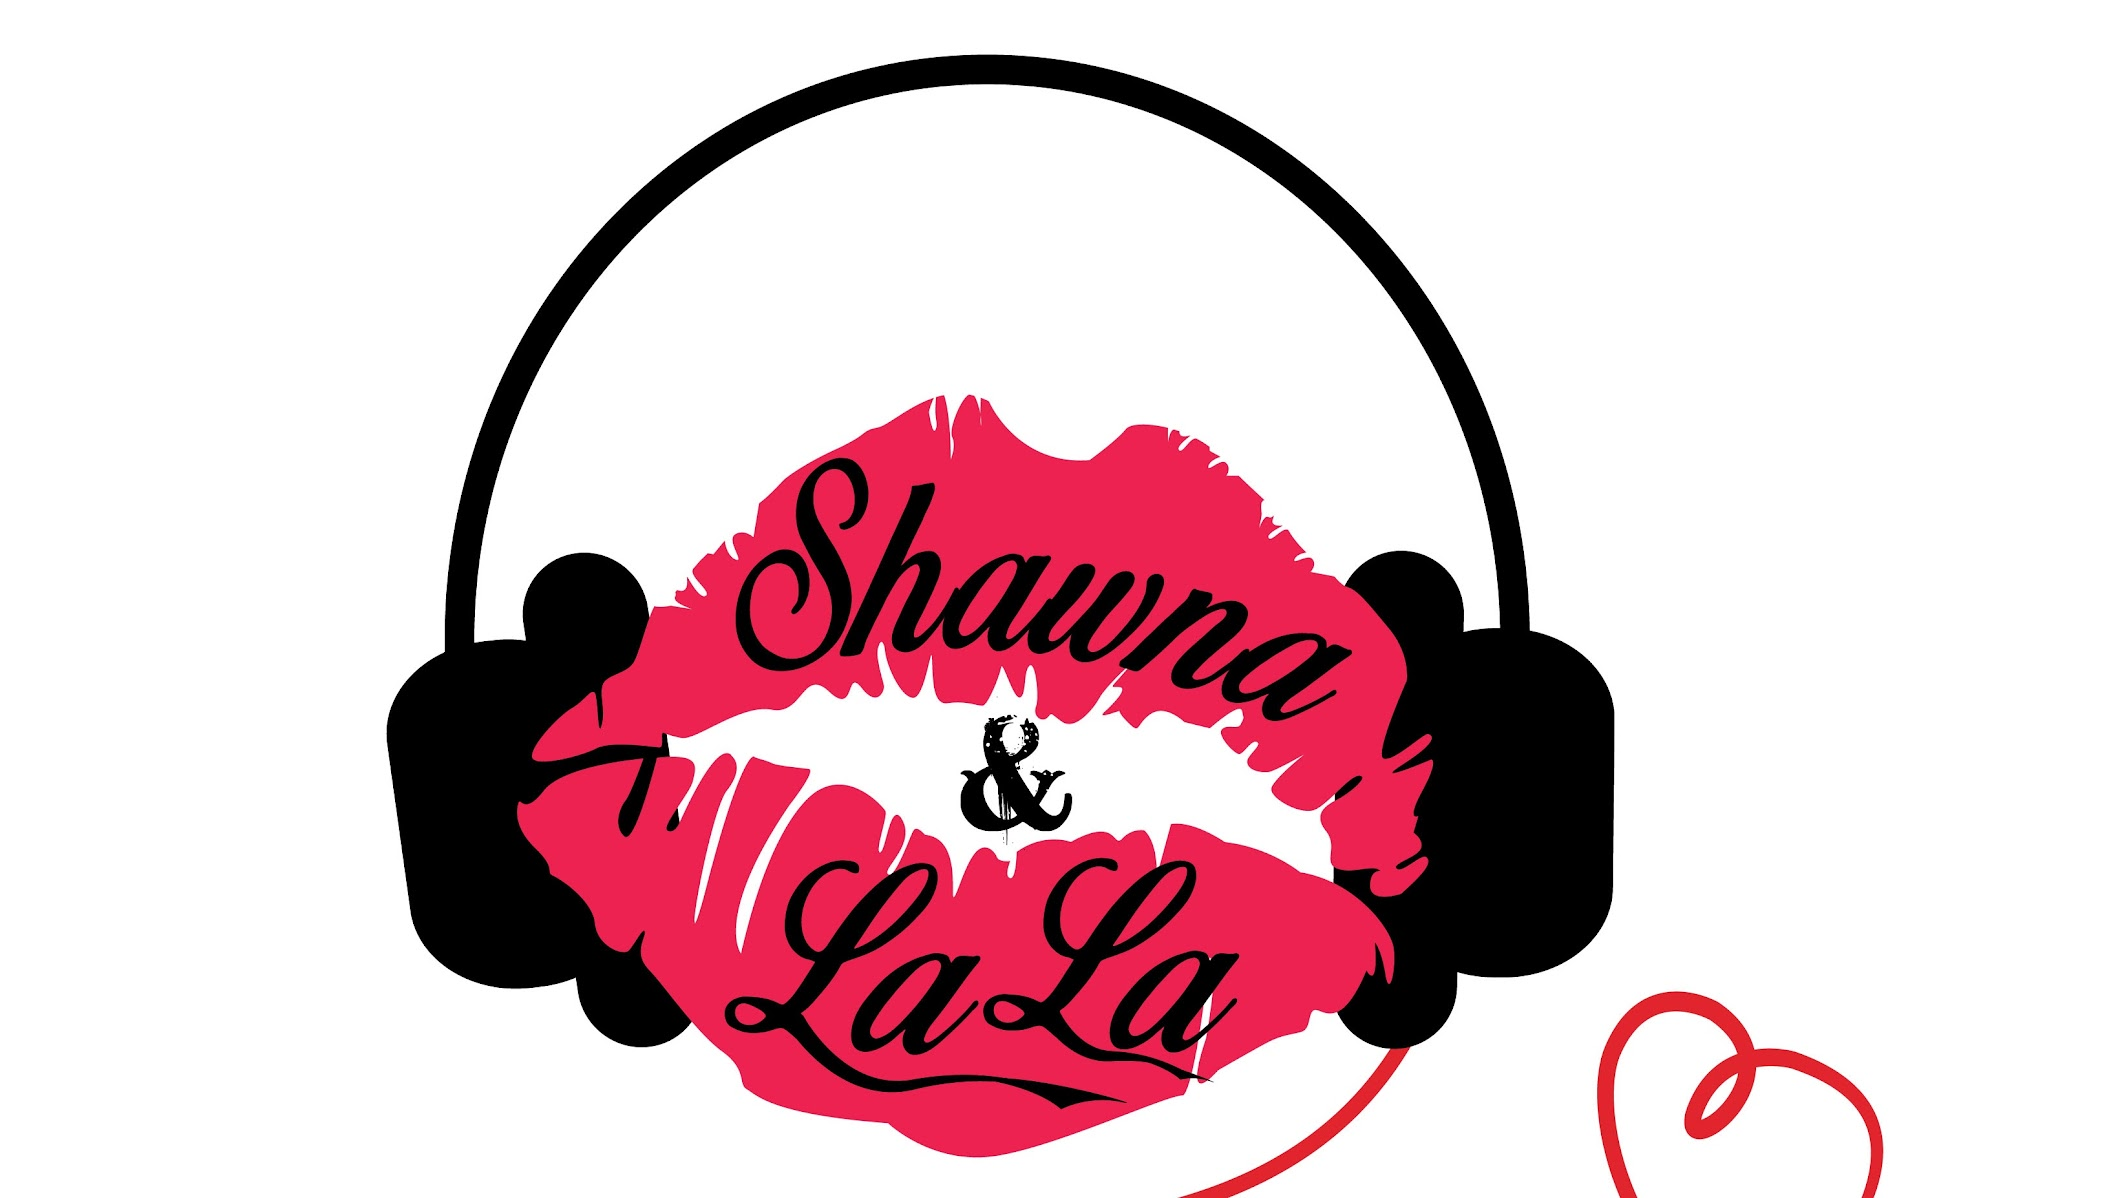 Shawna and LaLa On The Radio